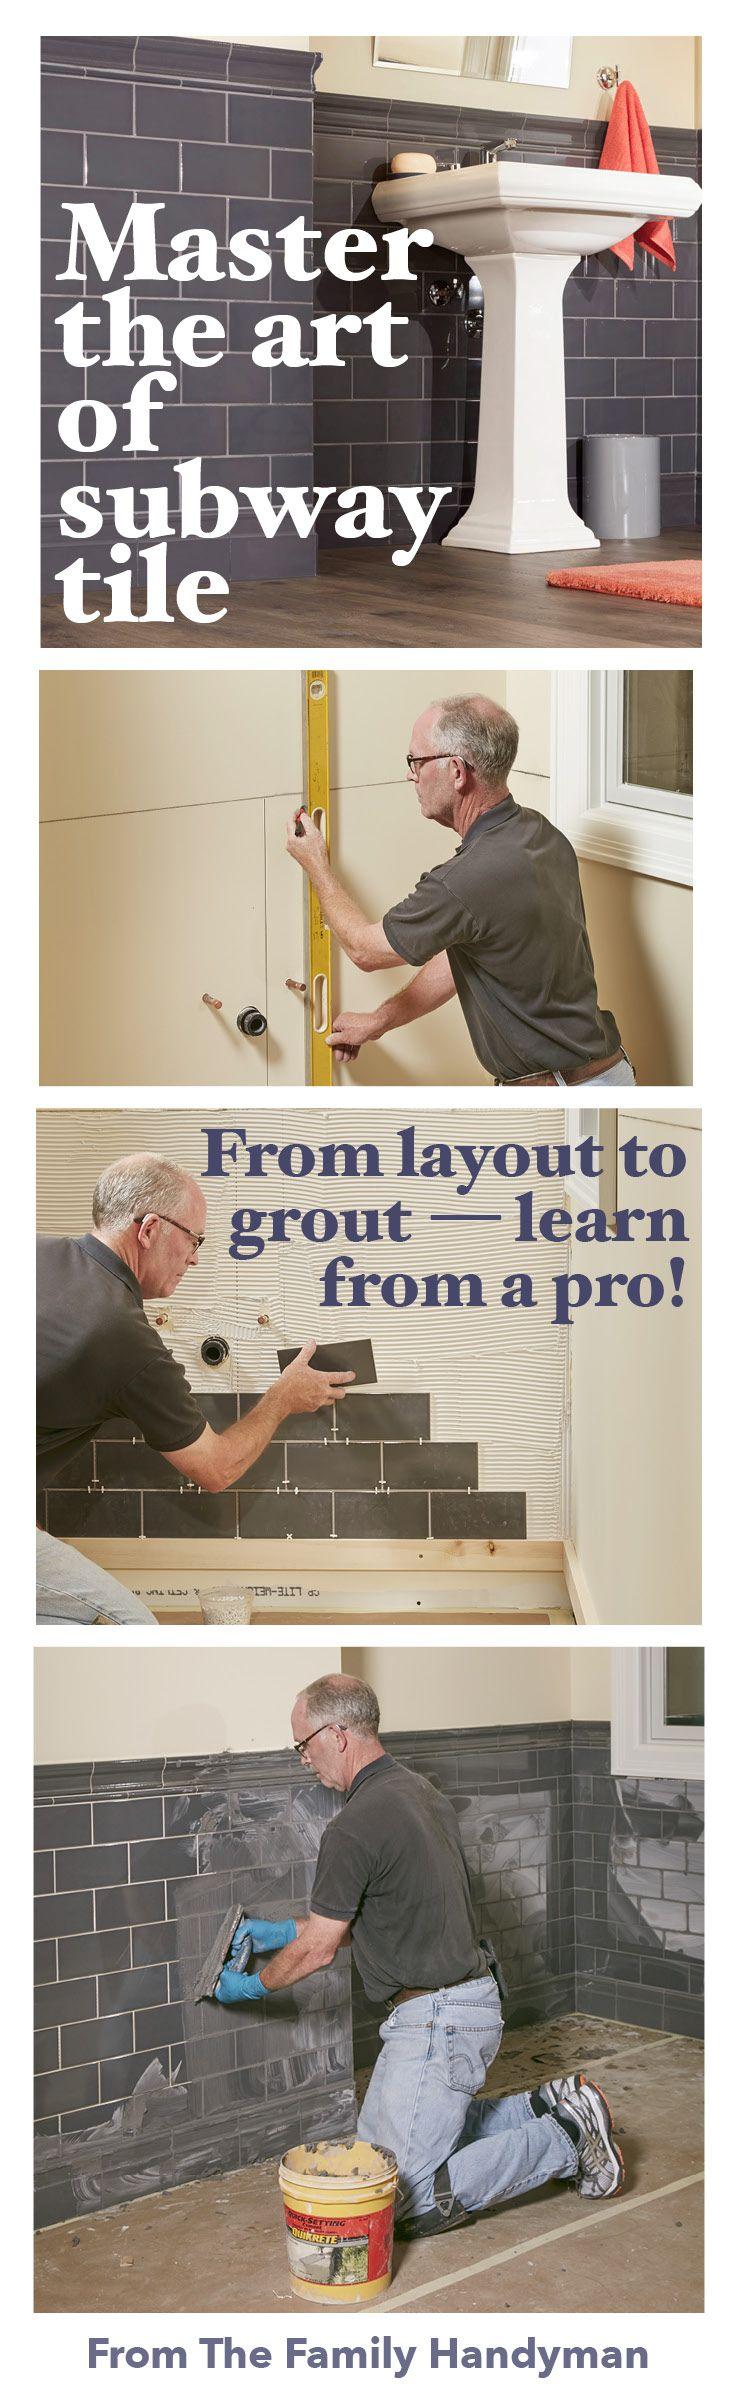 master the art of subway tile the bathroom kitchen remodel rh pinterest com